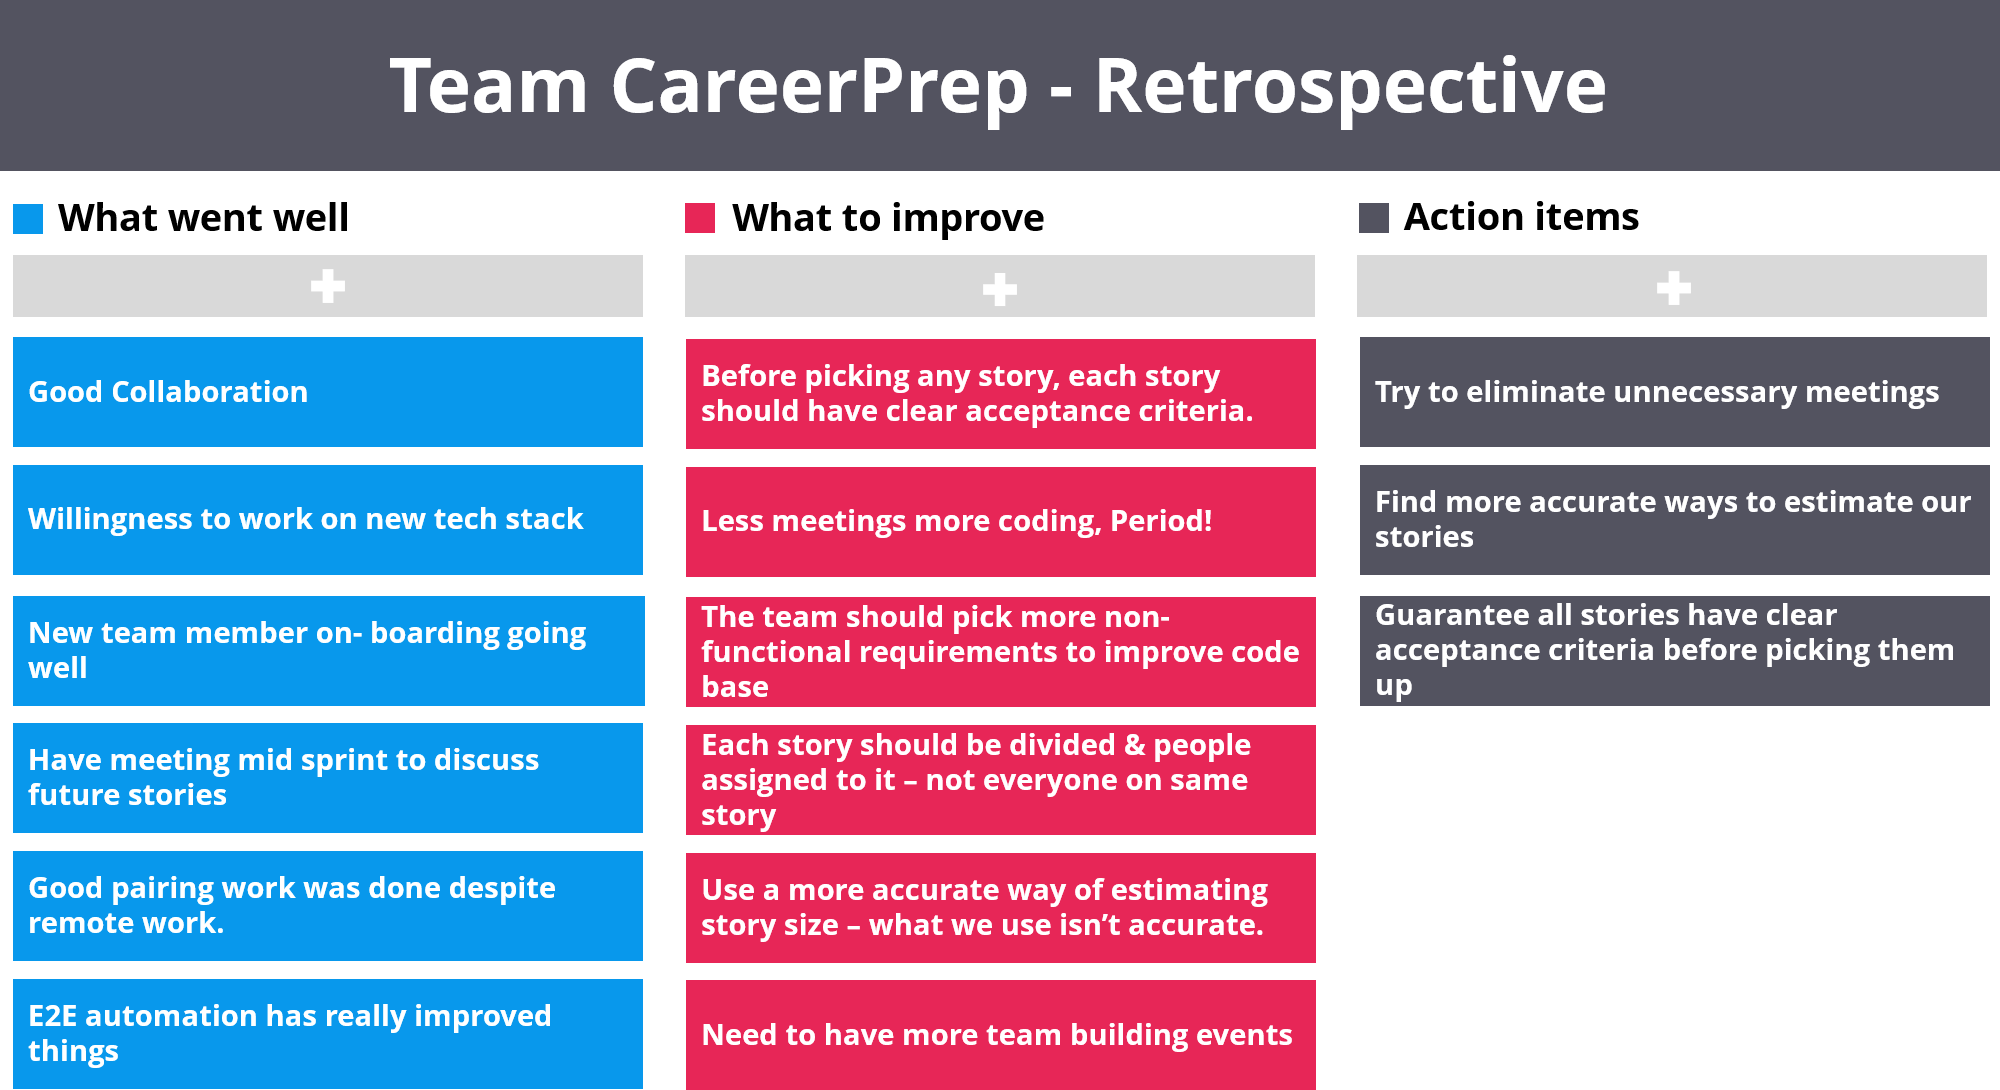 How To Do A Retrospective - what to improve